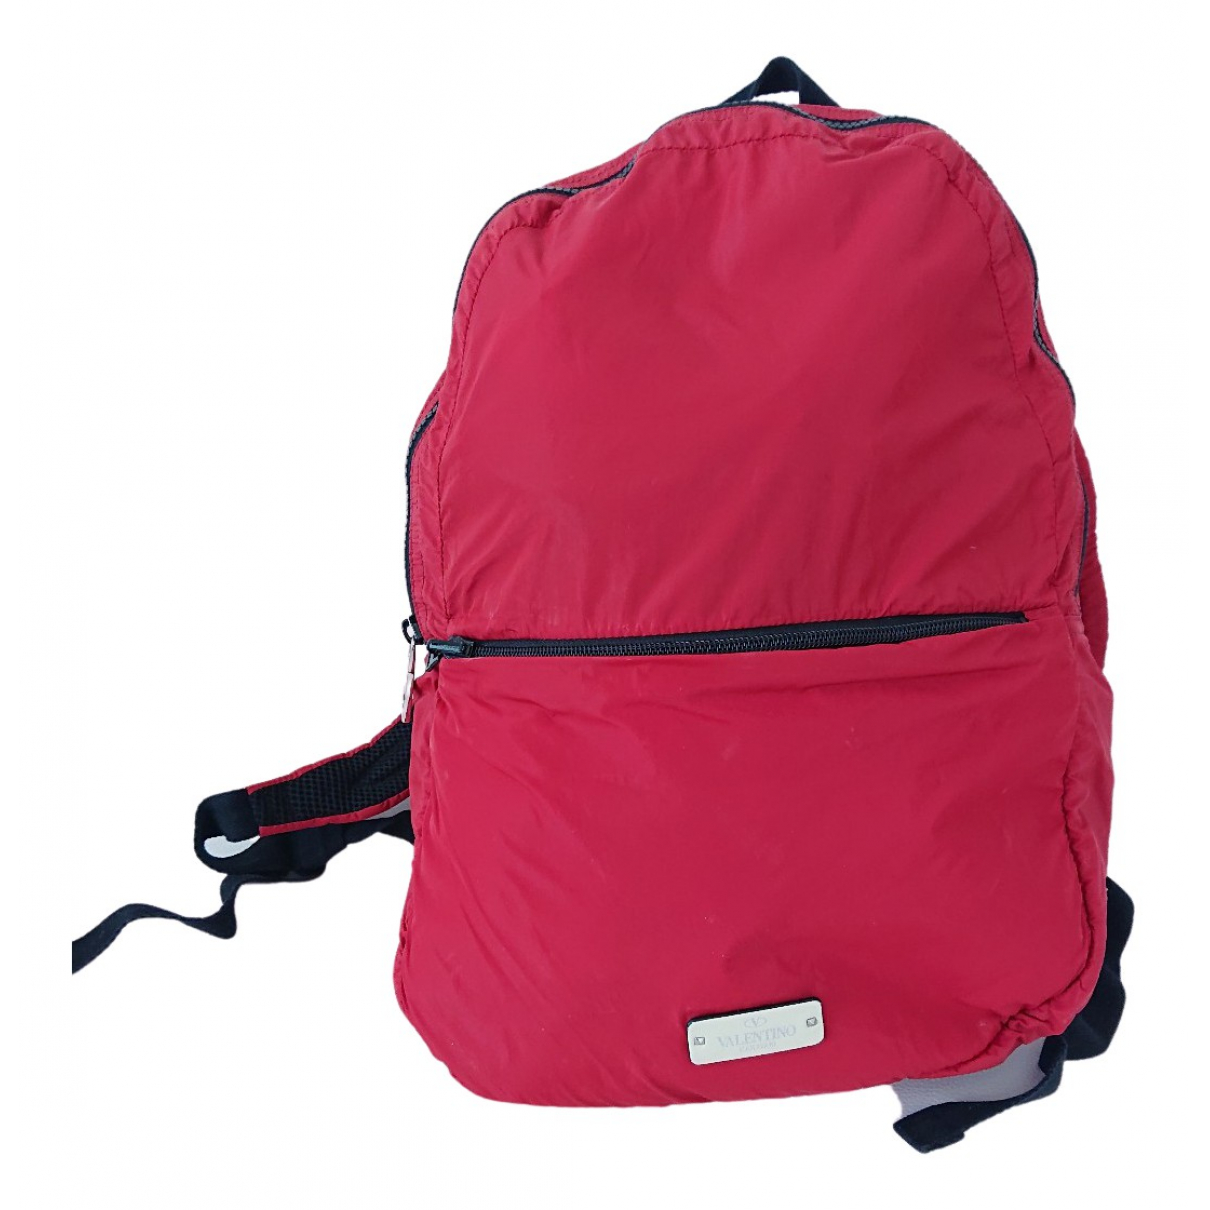 Valentino Garavani N Red backpack for Women N